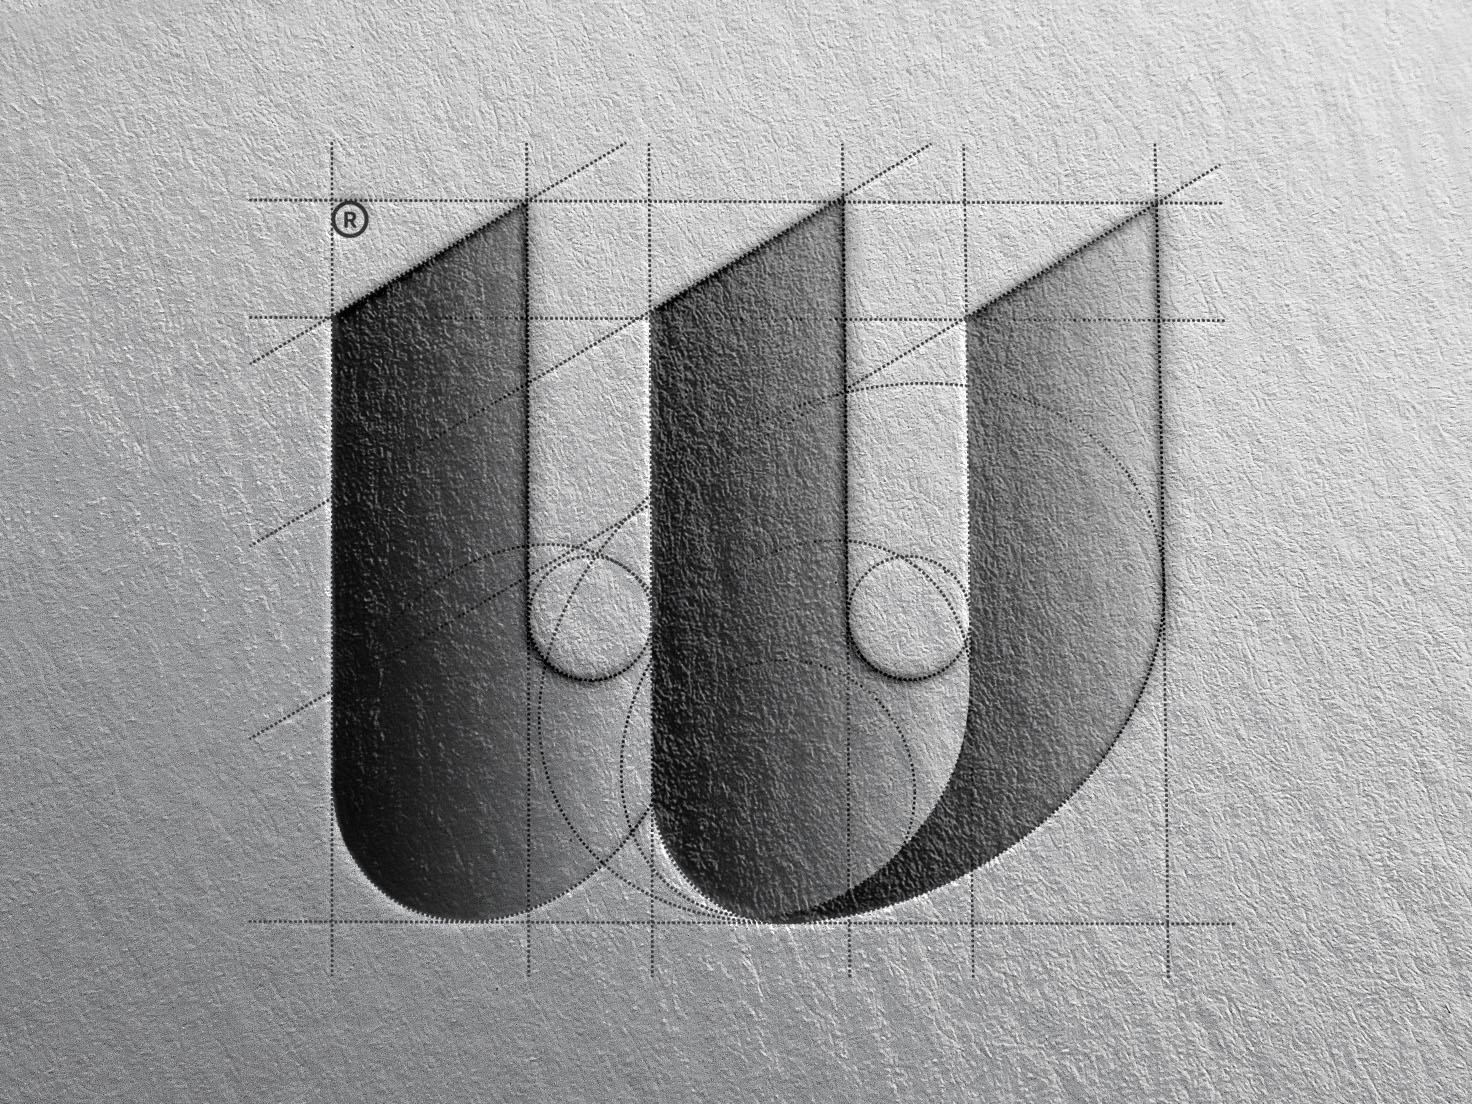 W logomark branding visual identity symbol logo illustration icon vector design